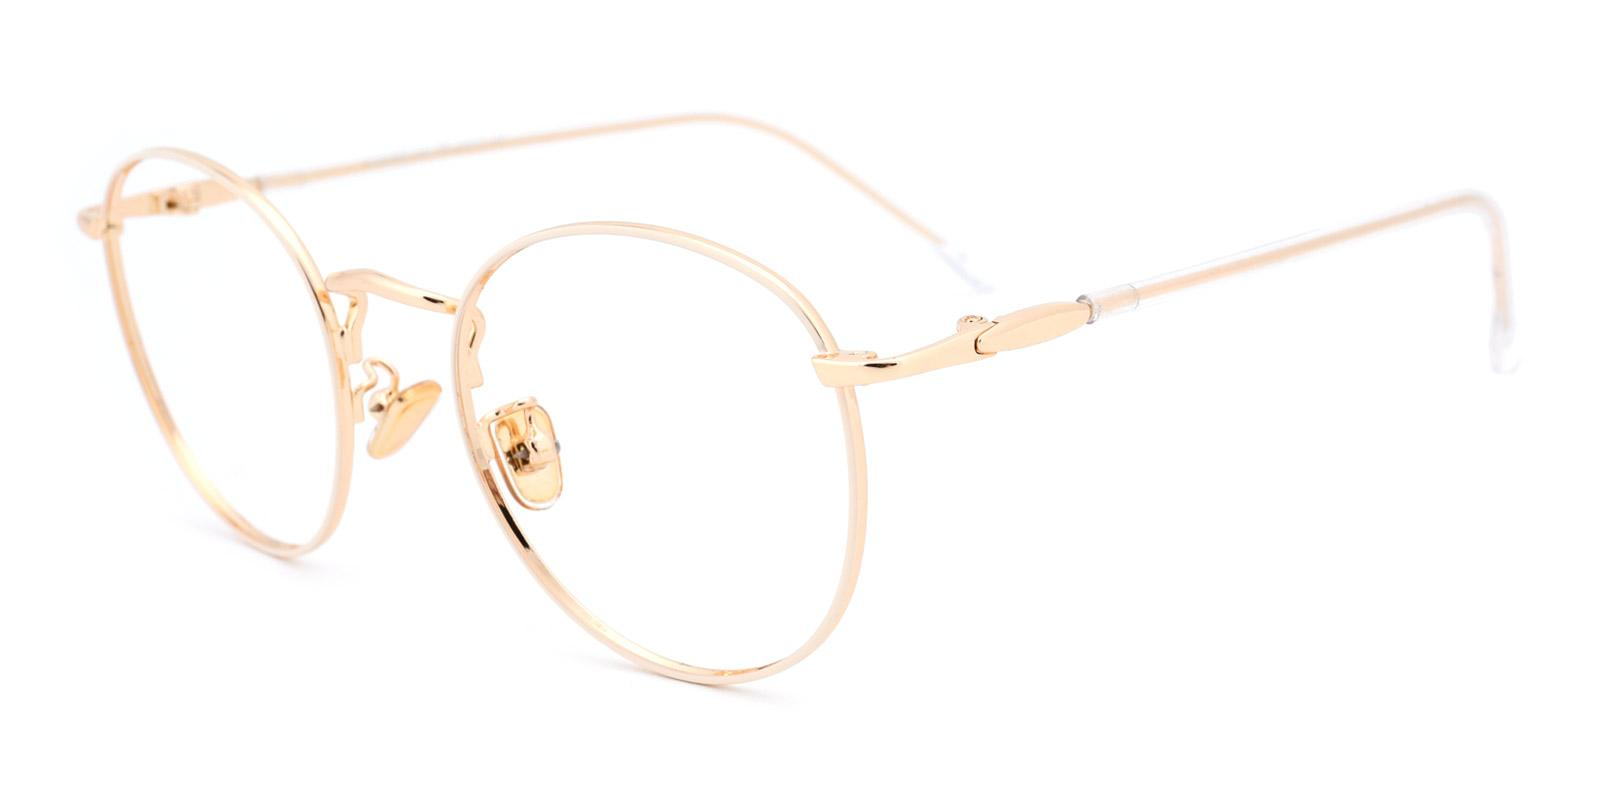 Donuts-White-Round-Metal-Eyeglasses-detail